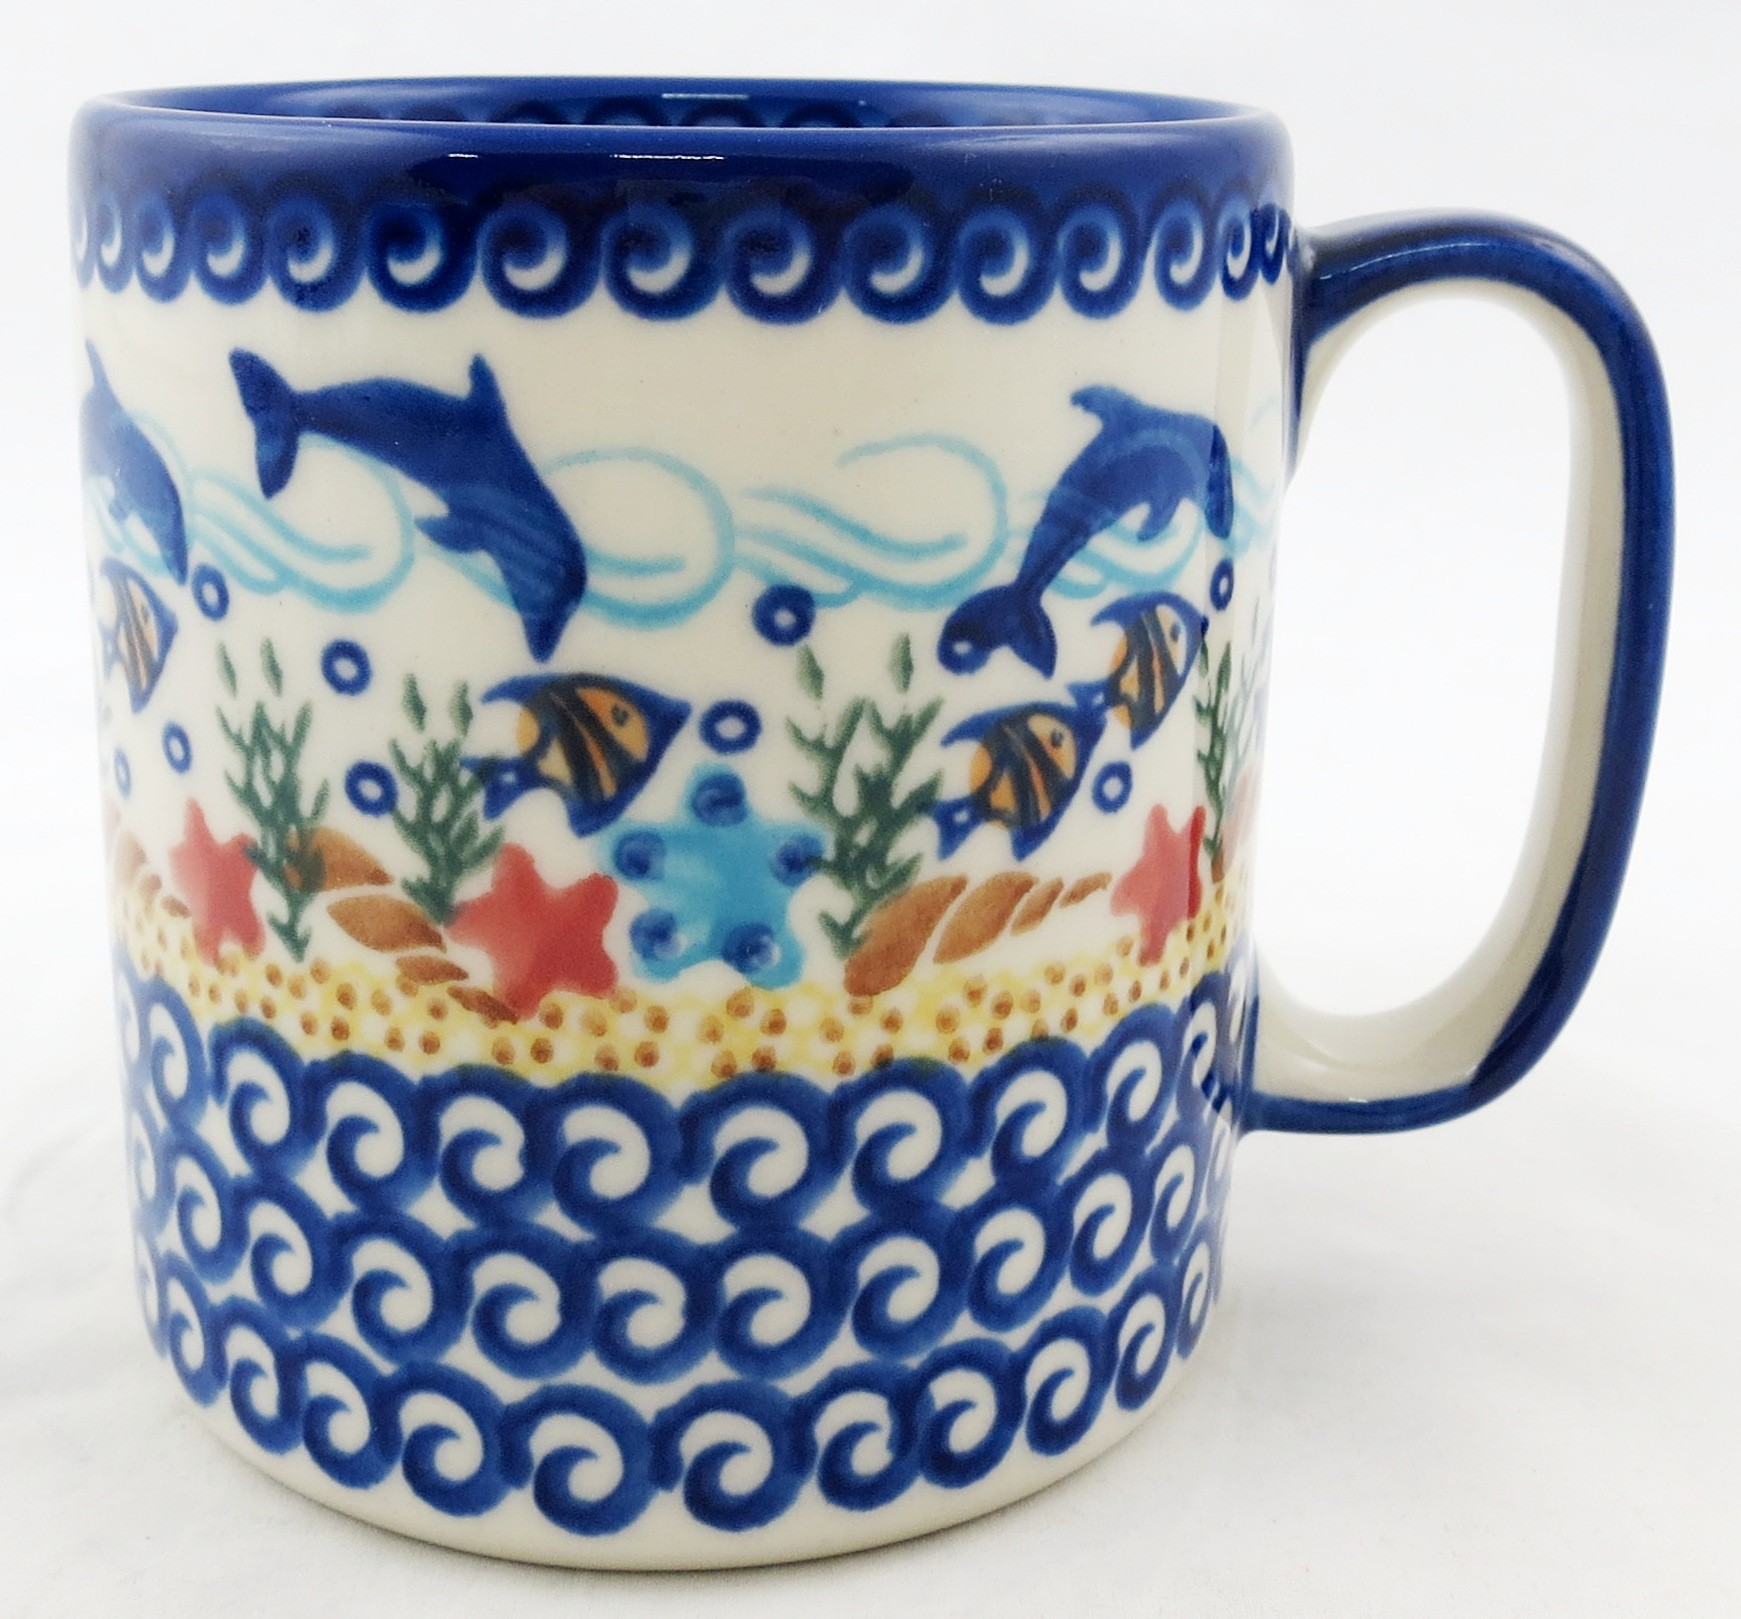 Pottery Avenue 12-oz Mug   VENA DOLPHIN